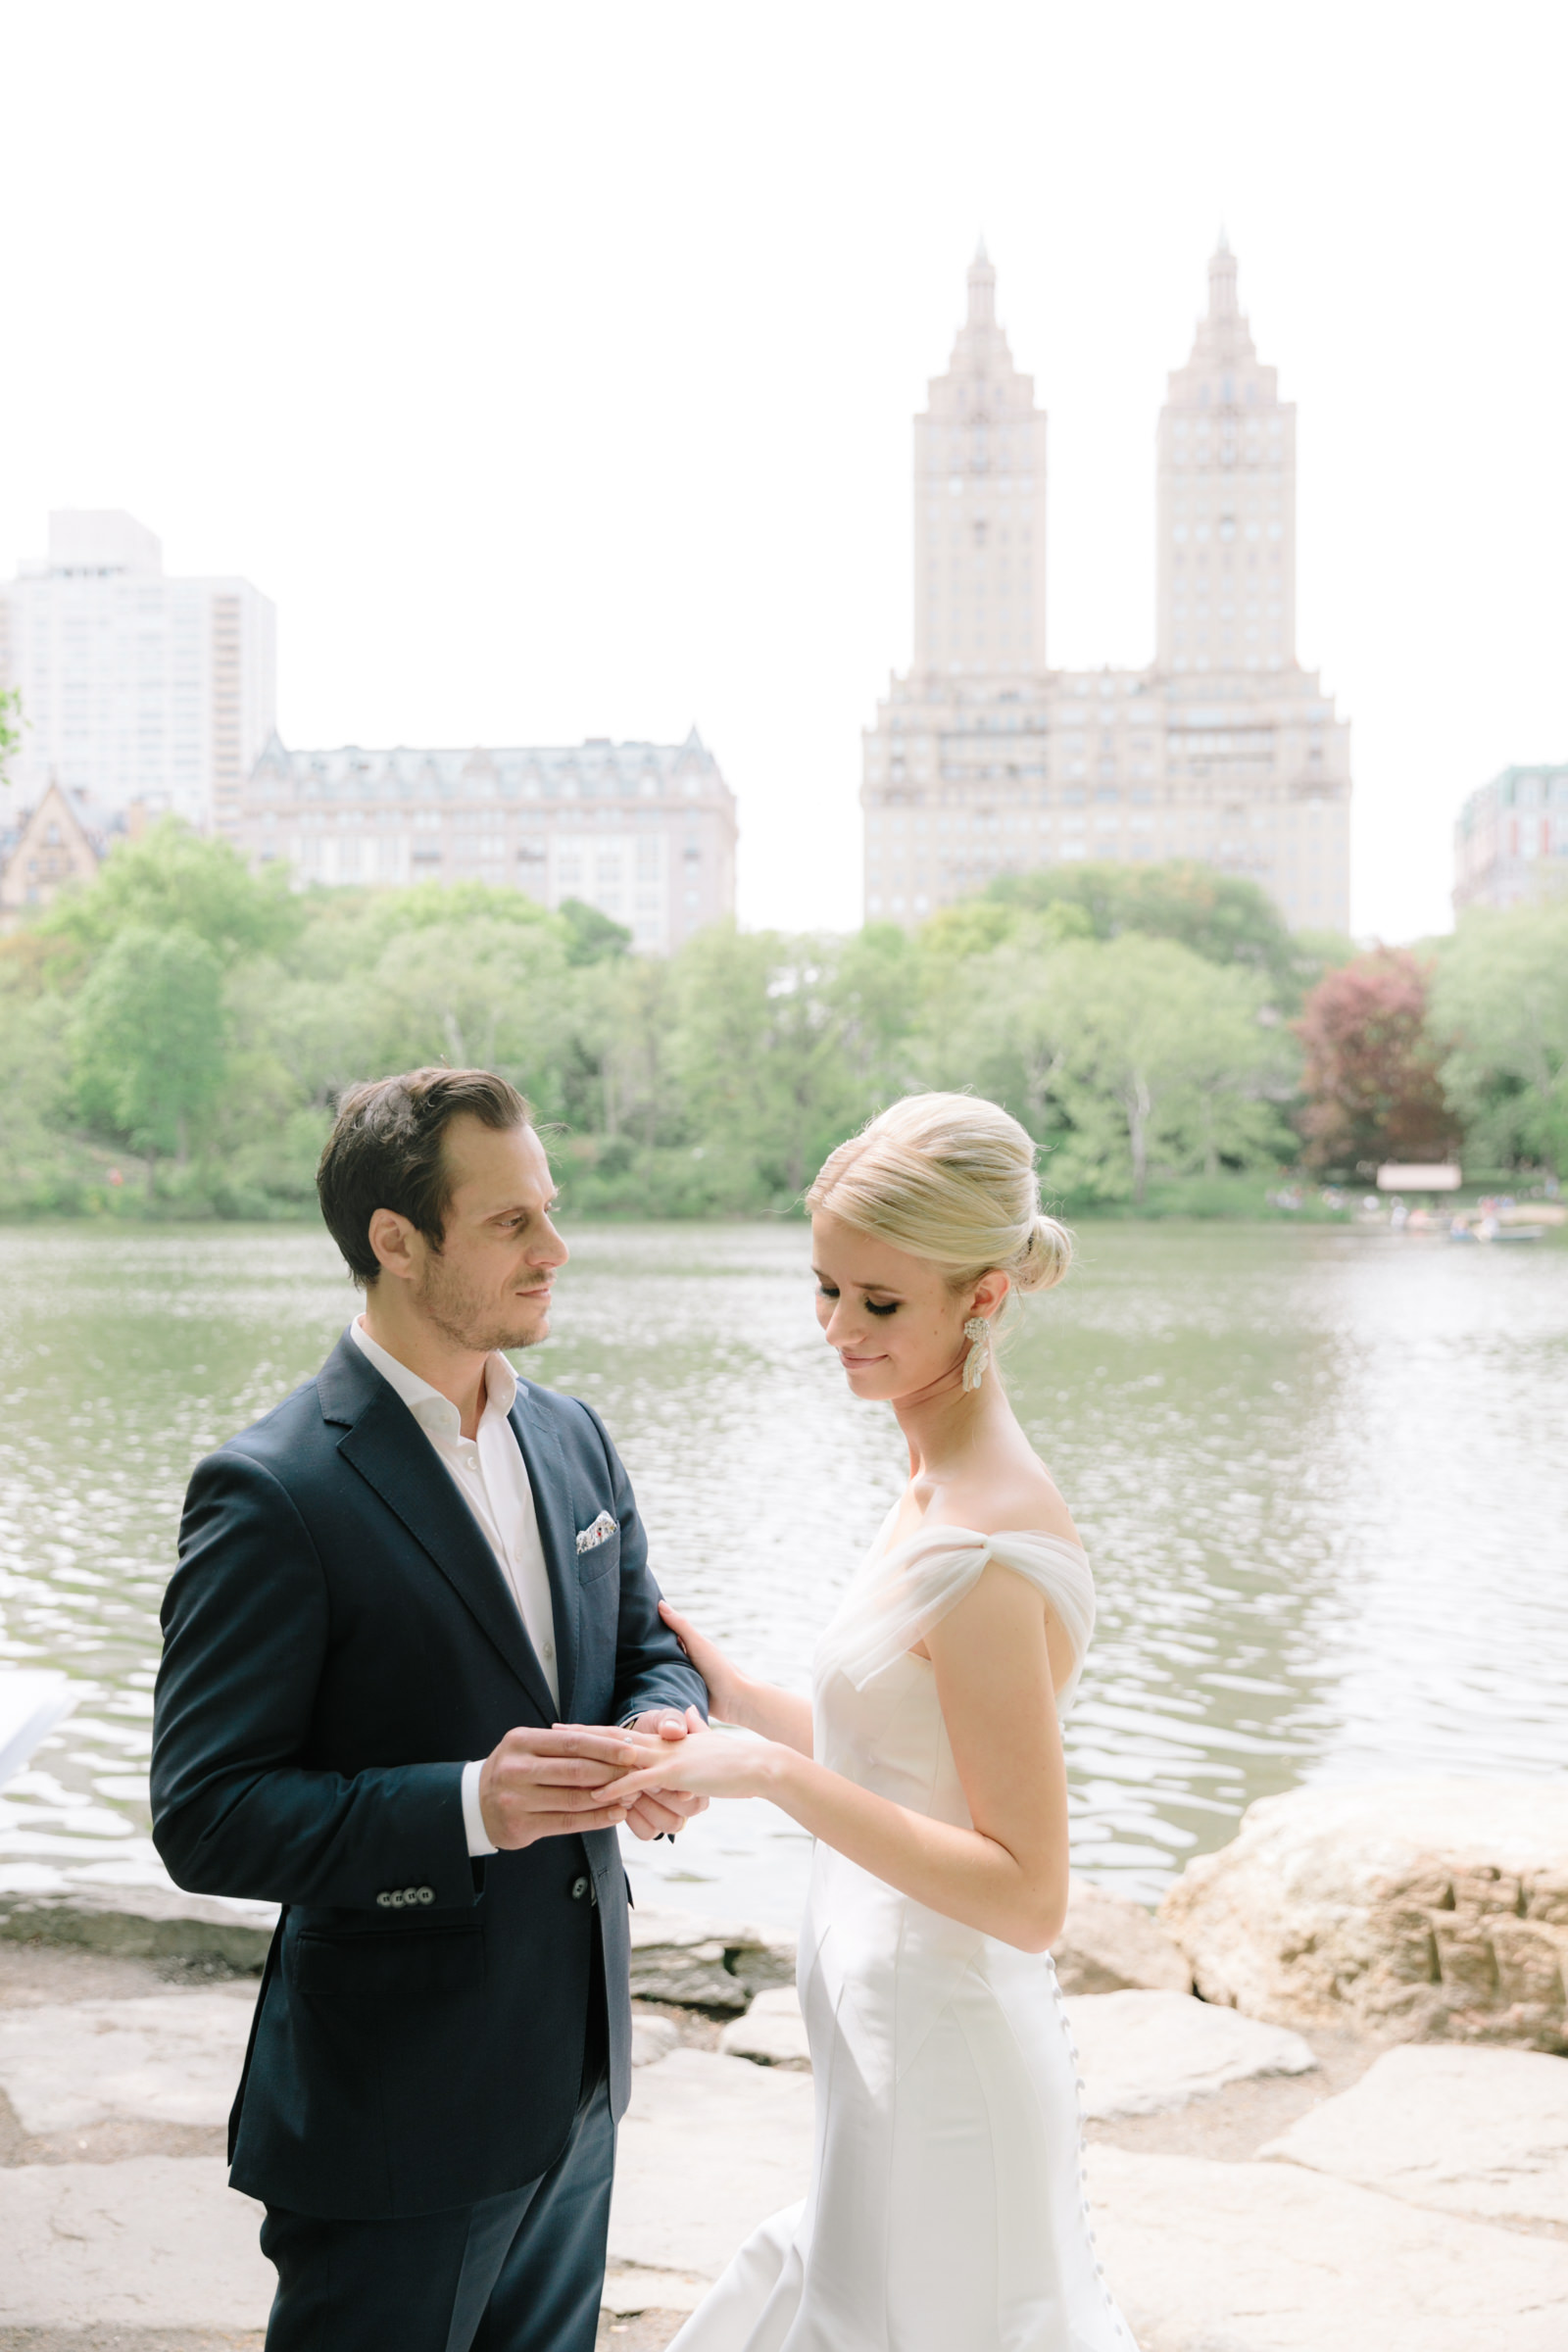 Intimate-NYC_wedding_ by Tanya Isaeva-104.jpg